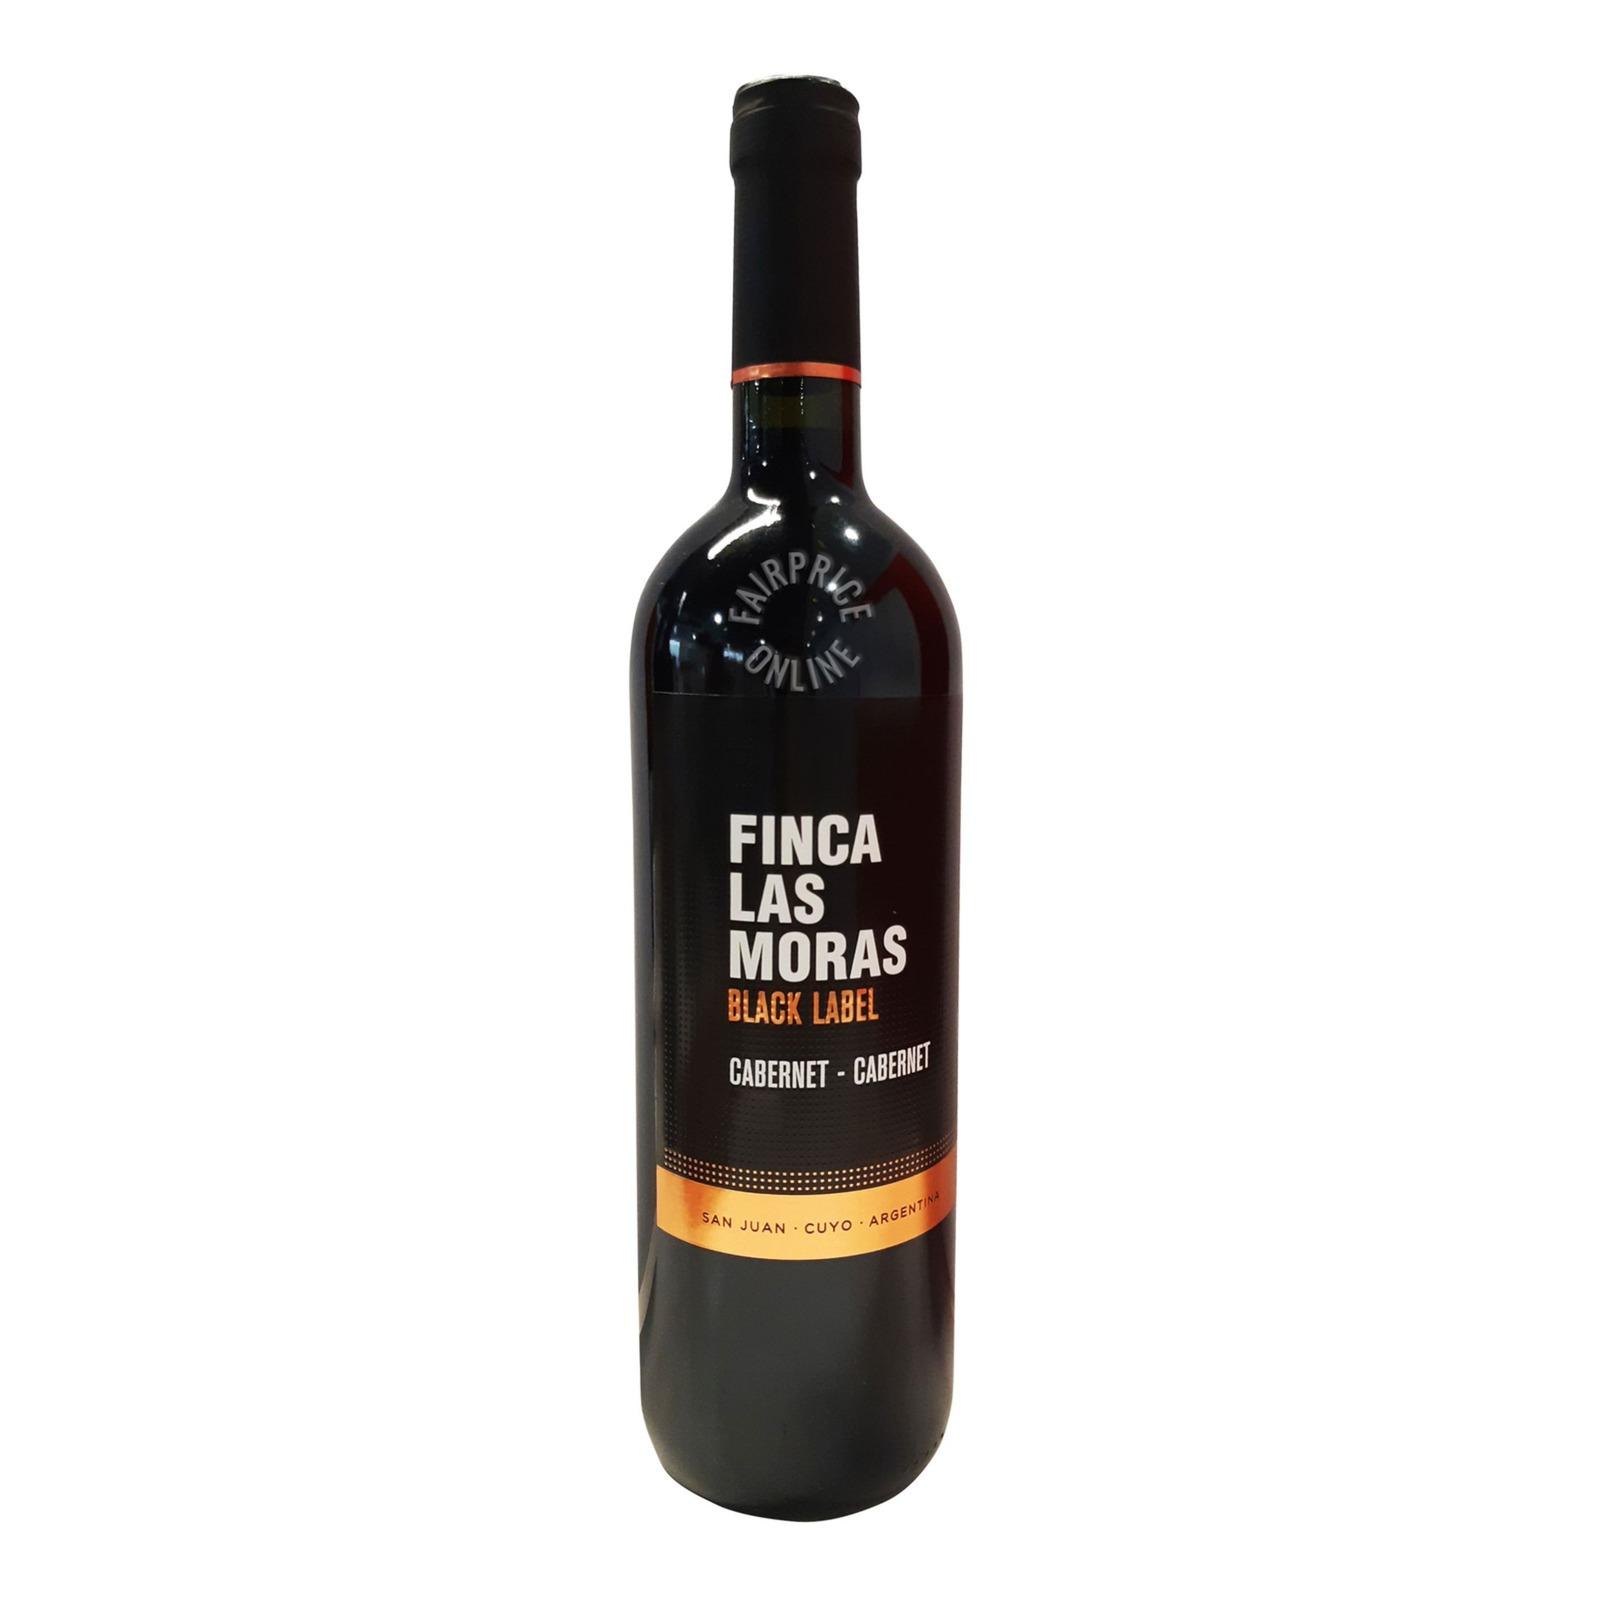 Finca Las Moras Black Label Red Wine - Cabernet Franc